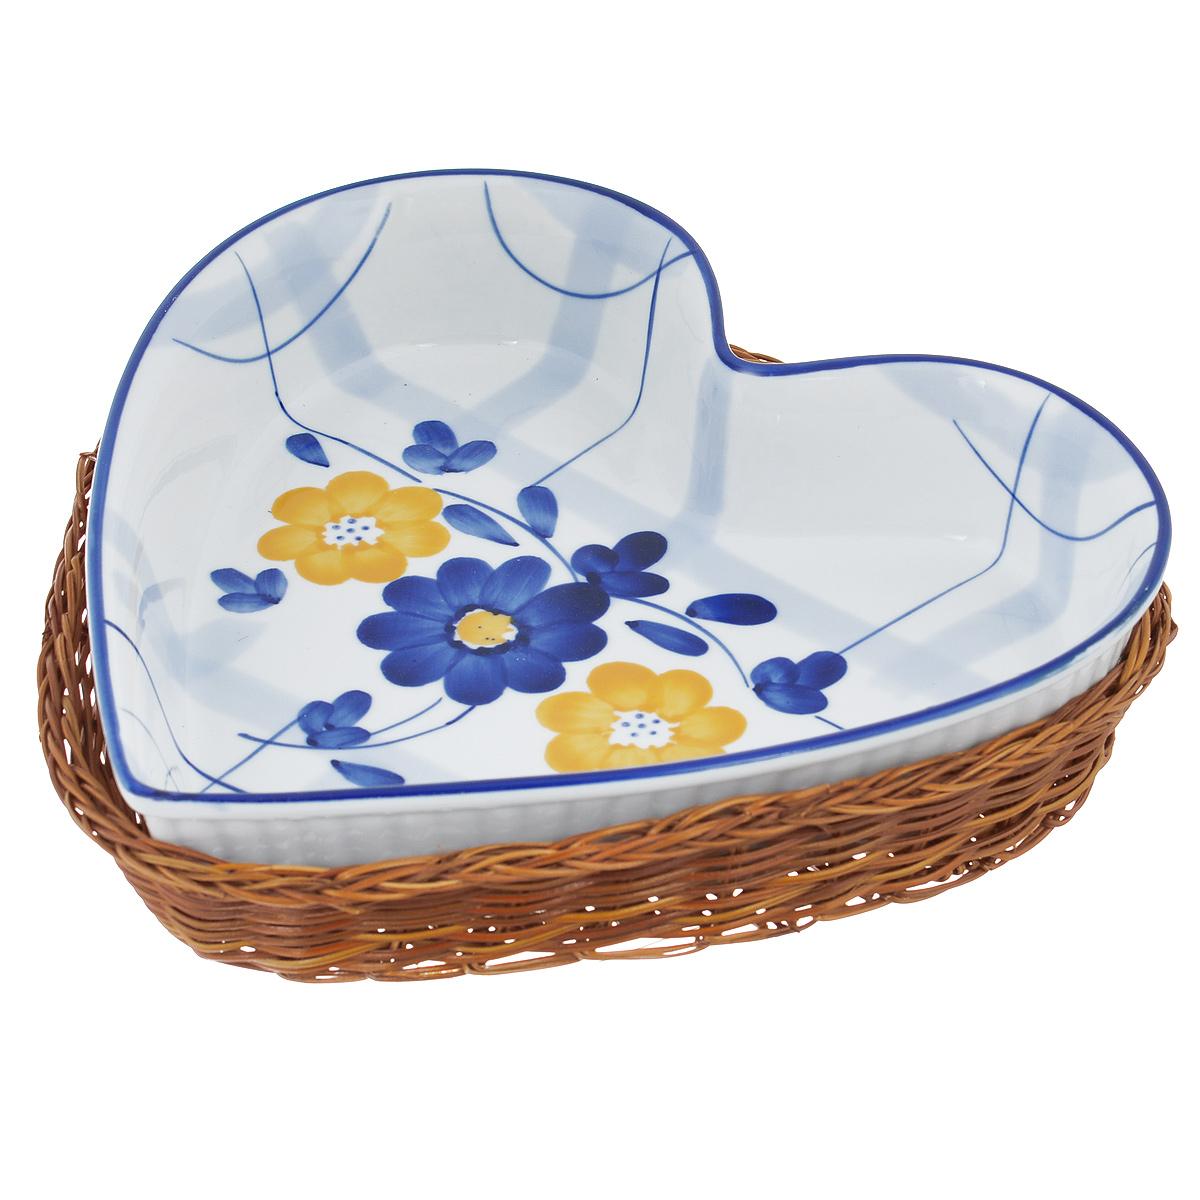 Блюдо Bekker Dish с корзиной, цвет: синий, белый, 24,5 см х 24